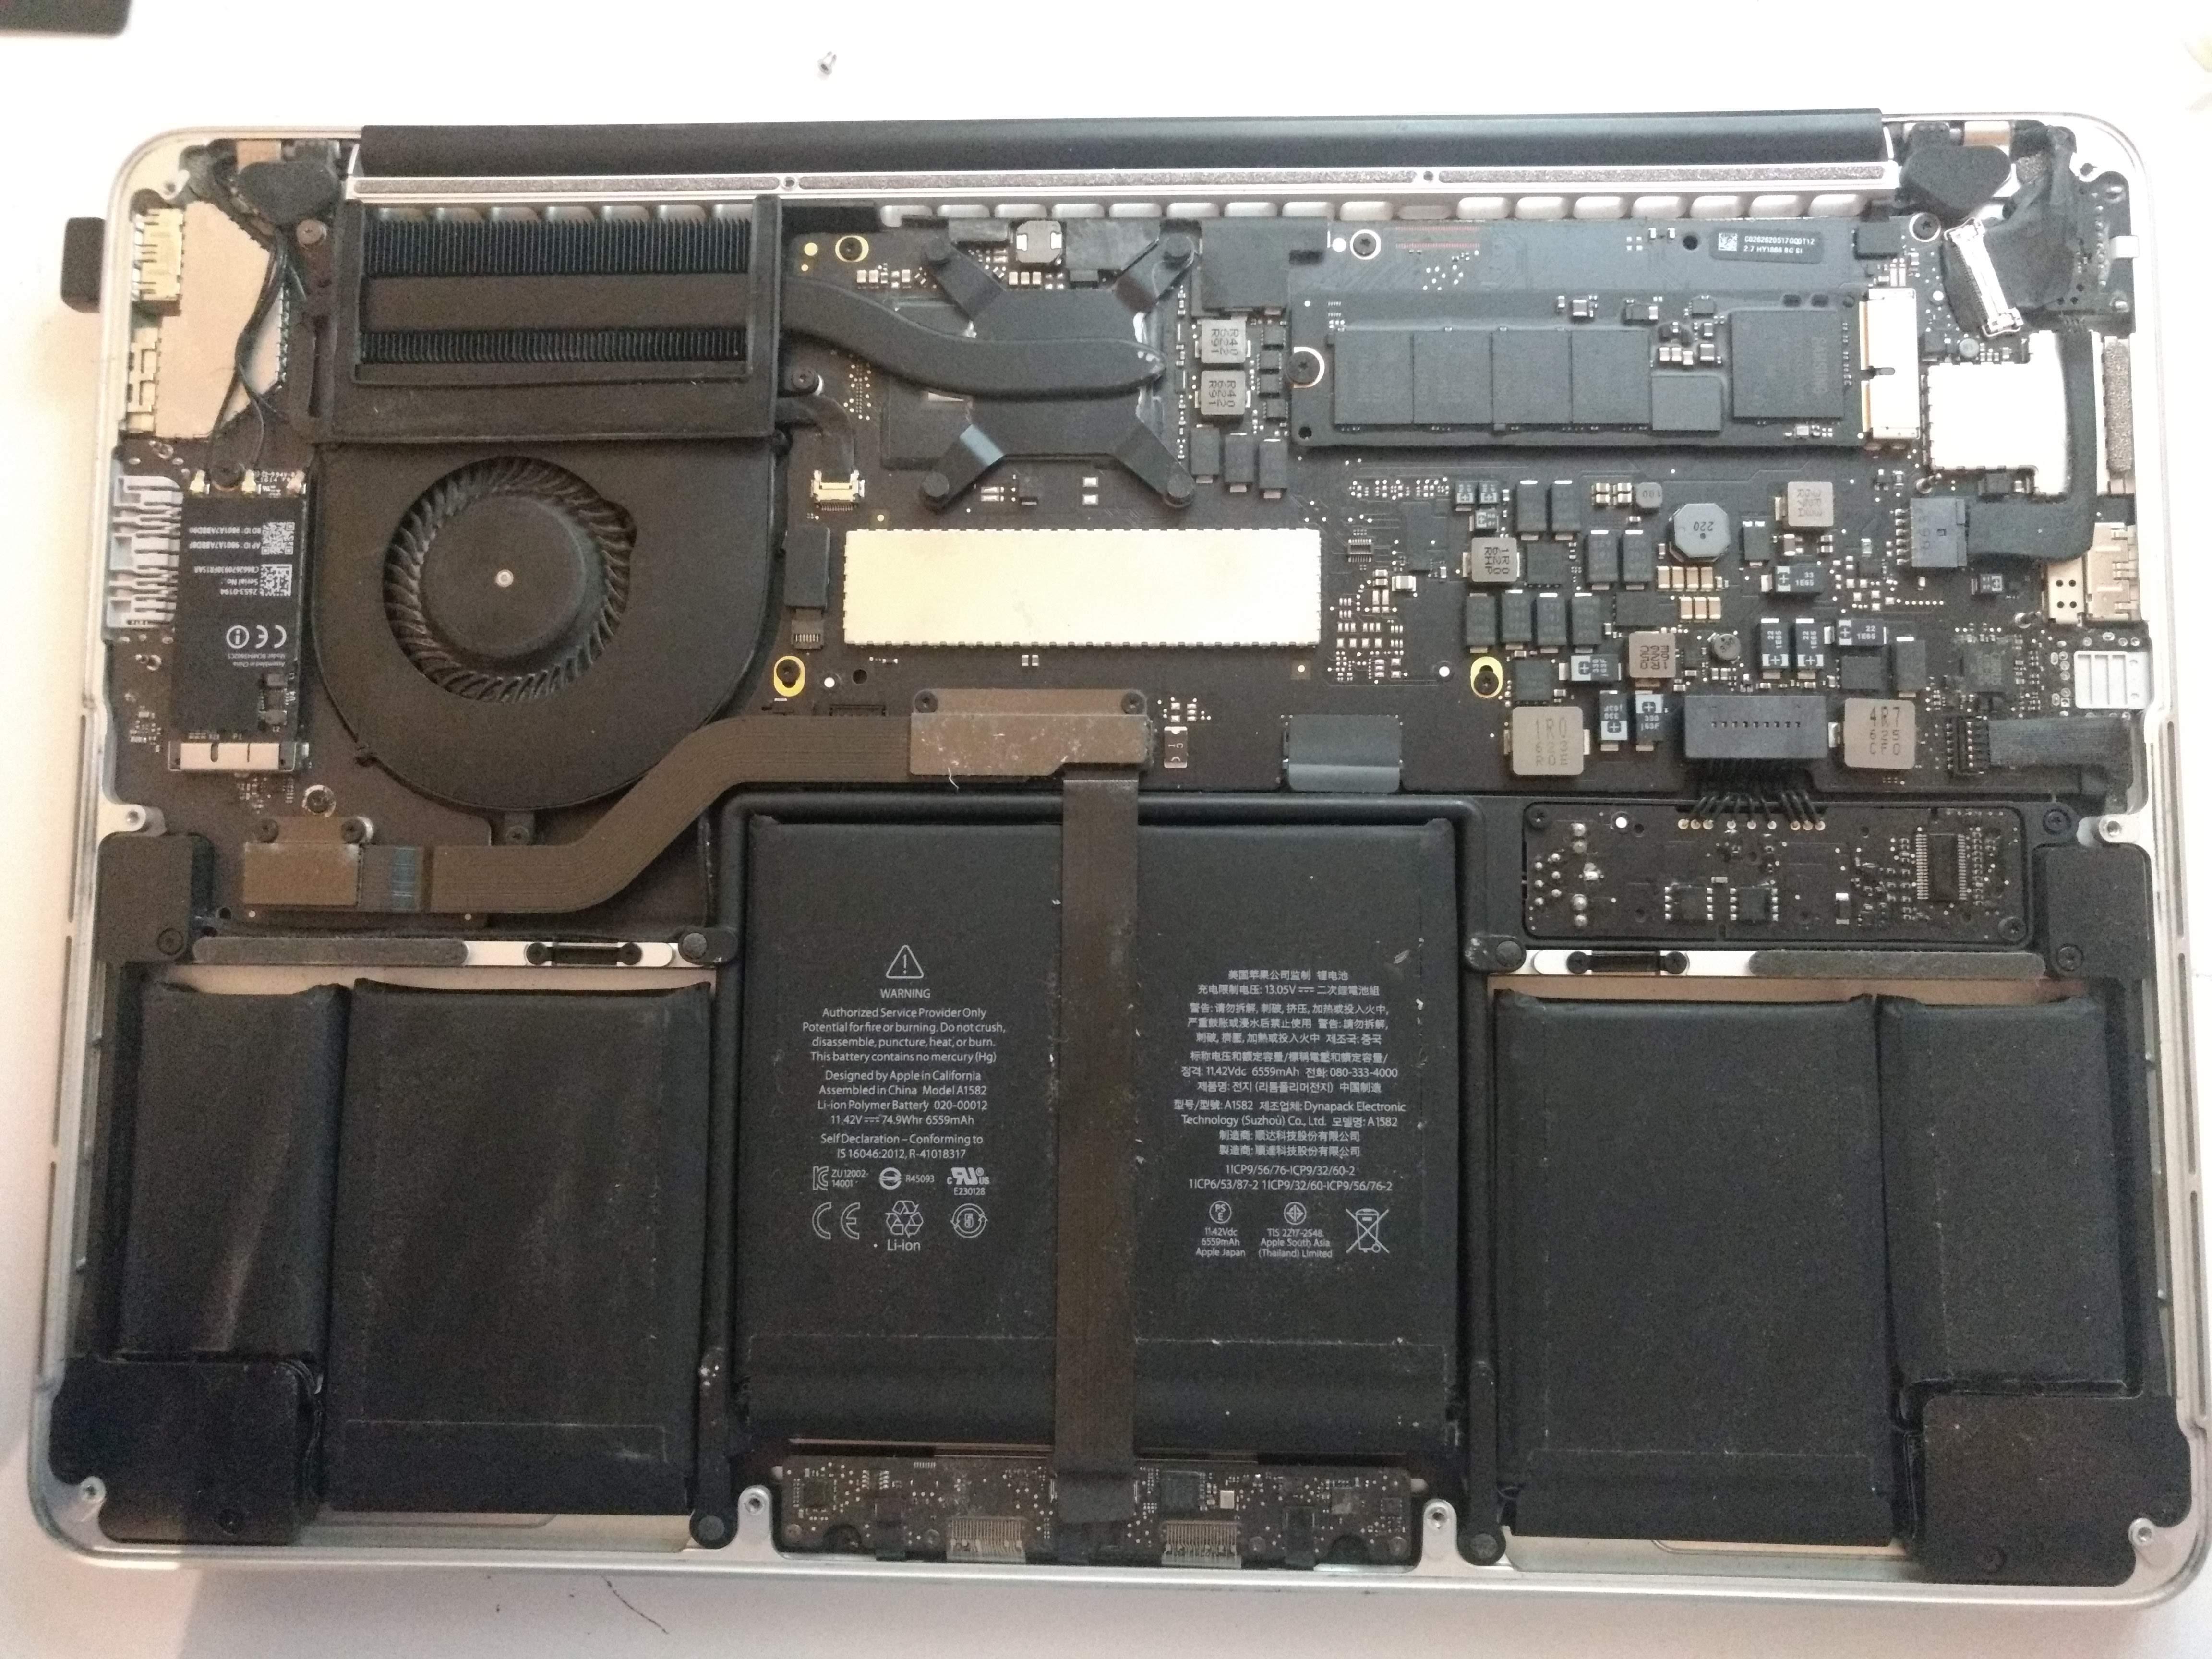 My Macbook Pro Early 2015